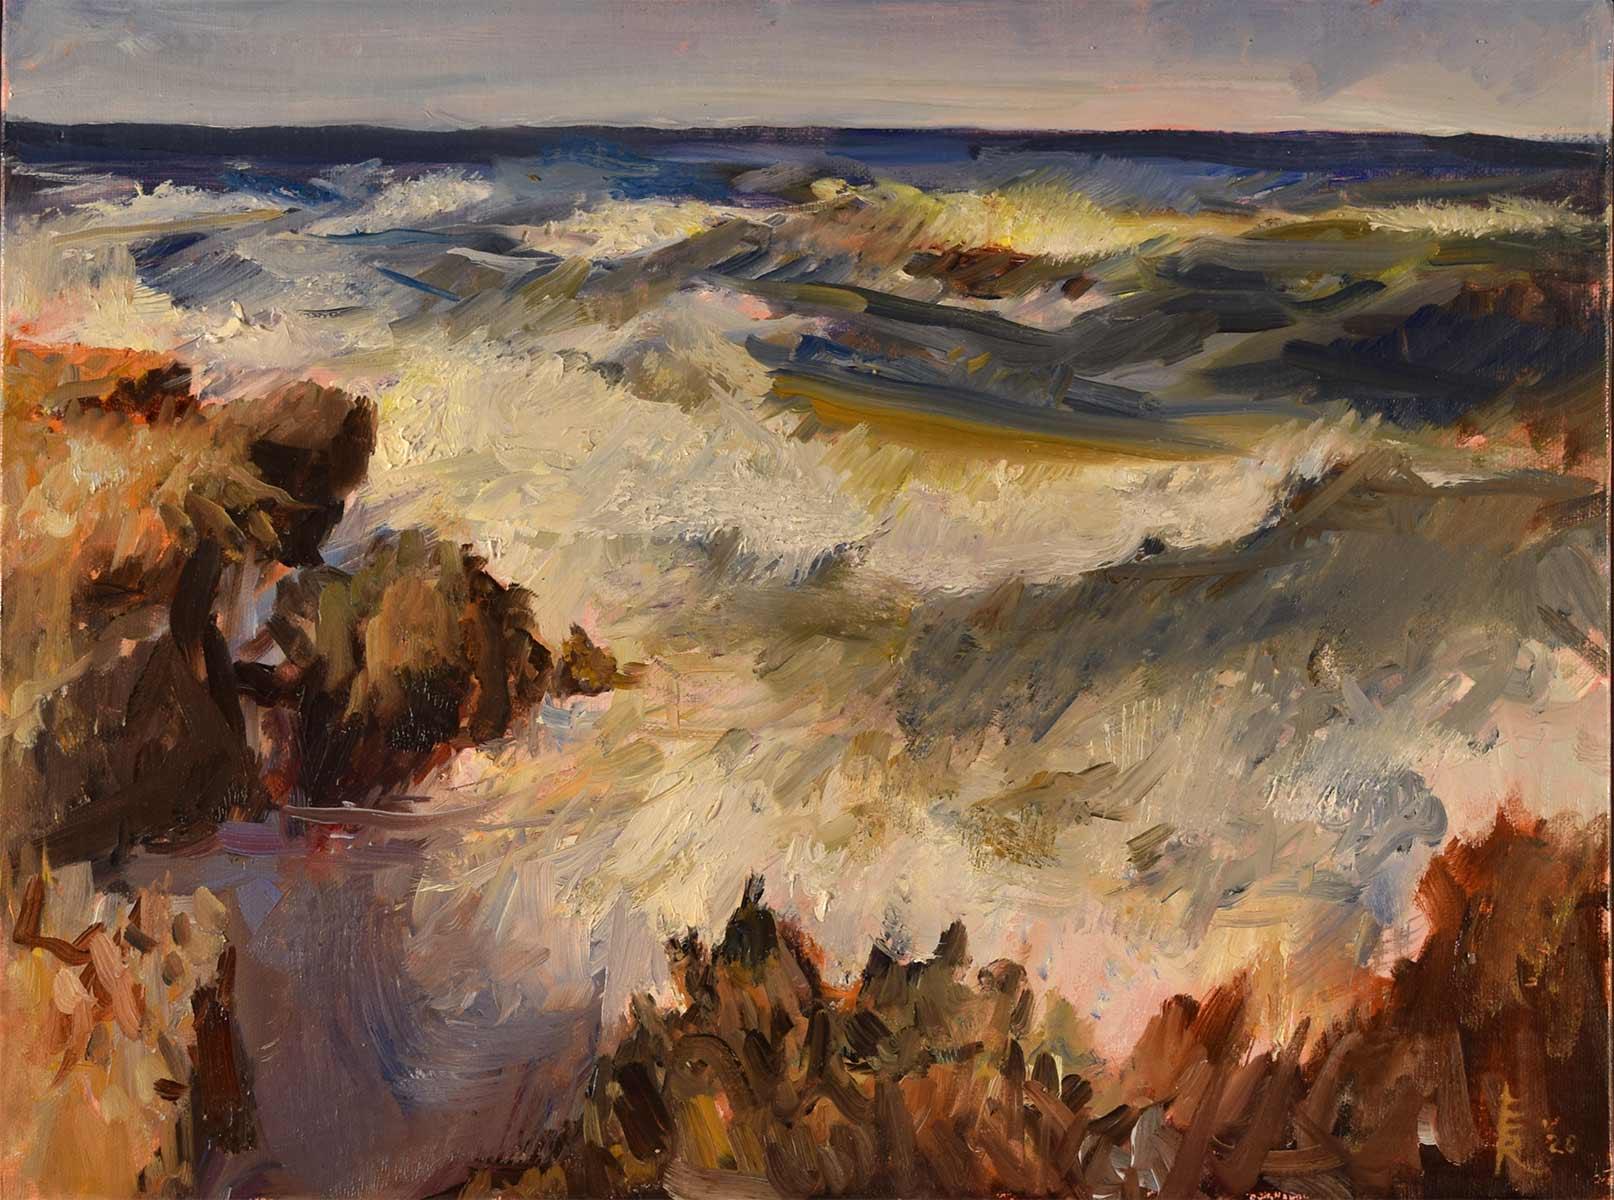 Blowing Rocks - Jupiter Florida Elizabeth Reed capturing the spirit of people and places